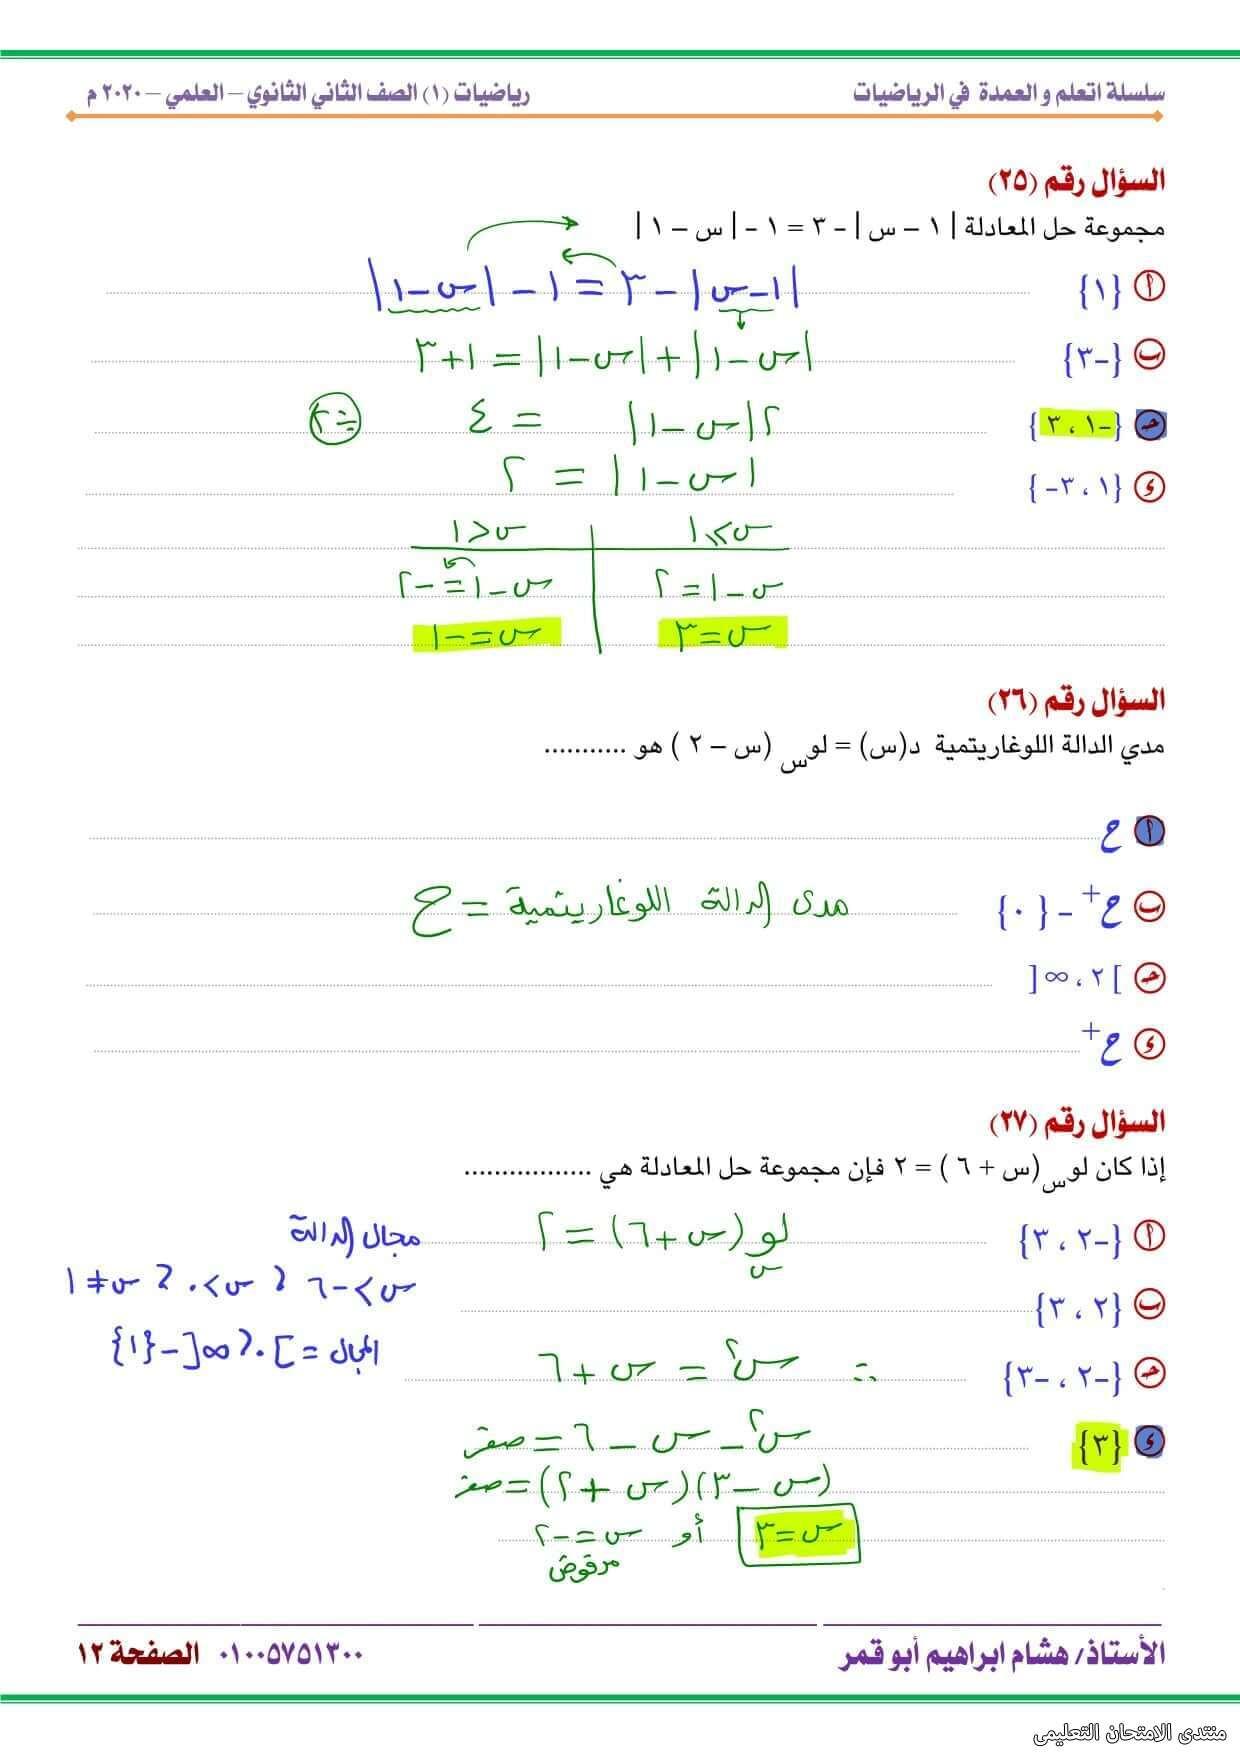 exam-eg.com_1614440949805911.jpg